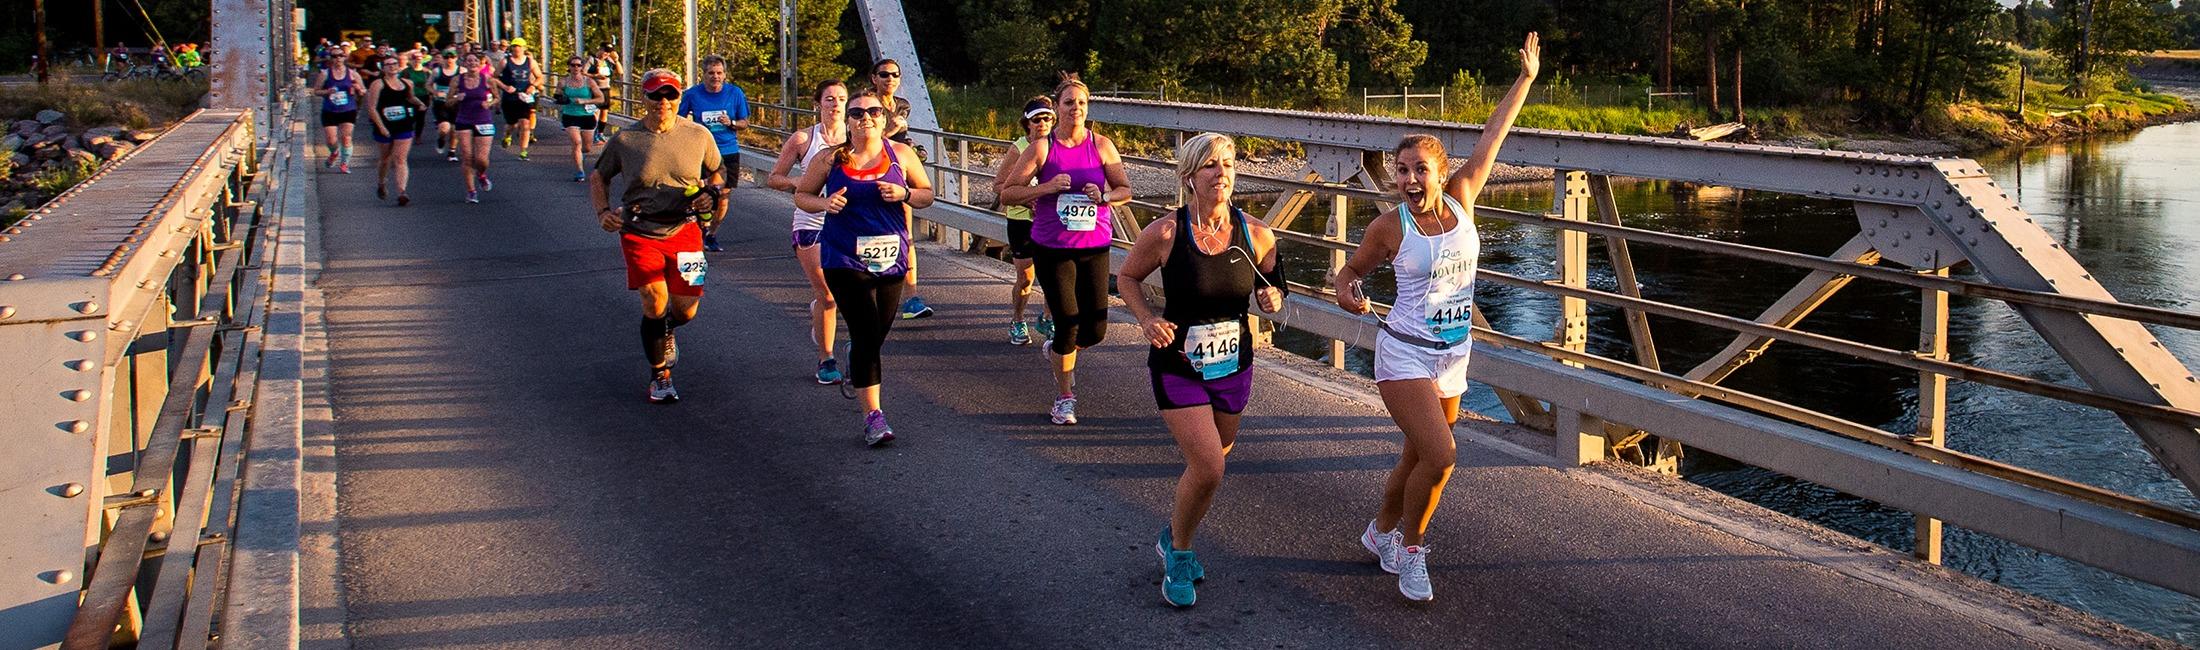 Missoula Marathon Ranks in Top U.S. Marathons Yet Again